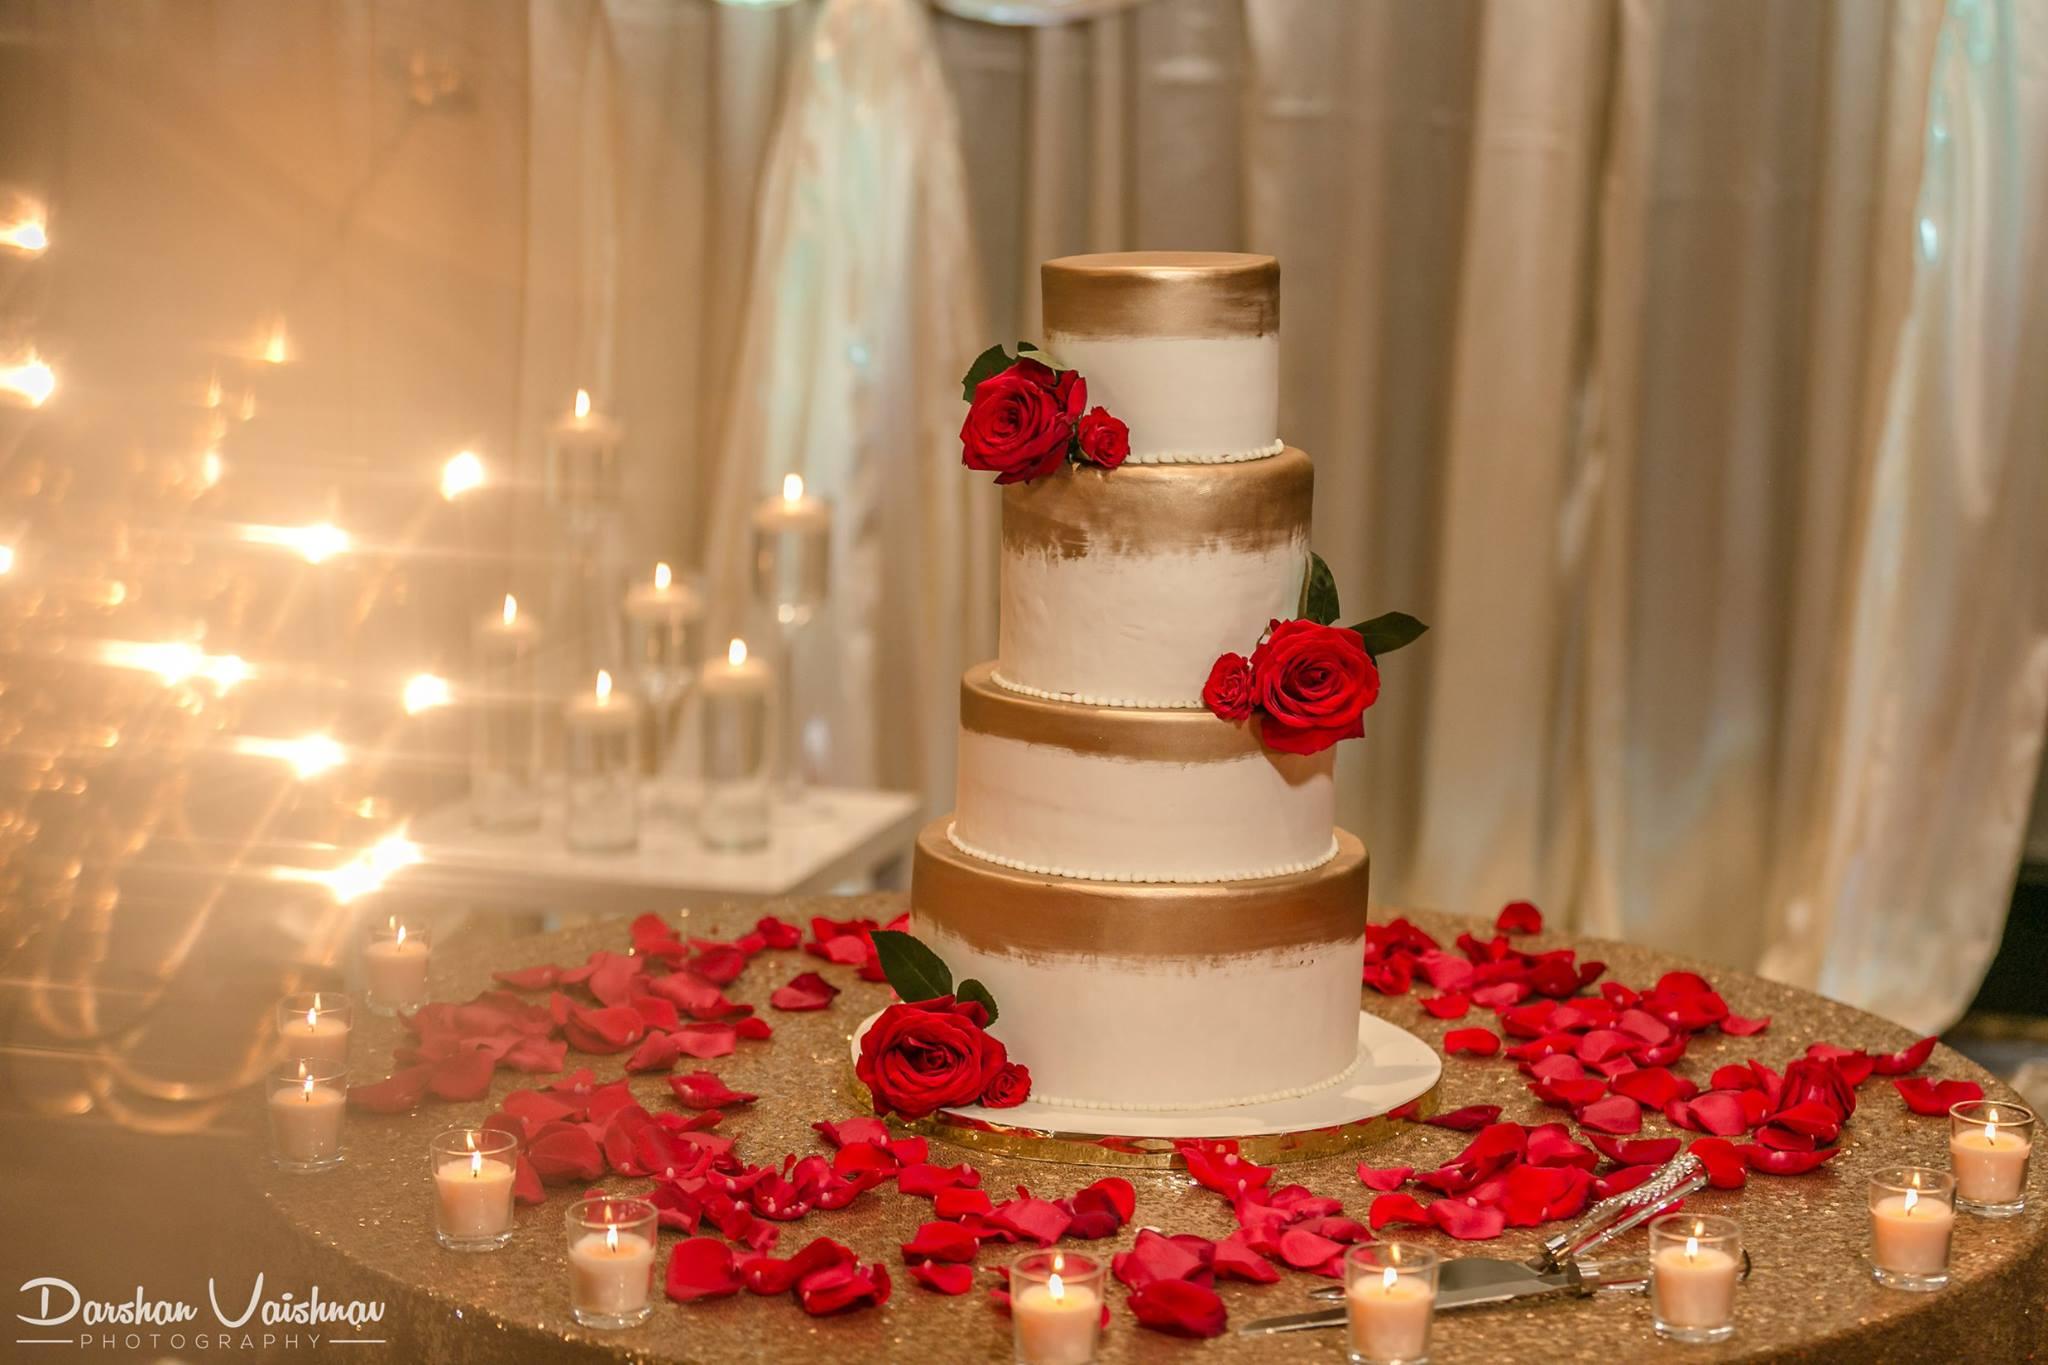 Imperial Decor - Wedding Decorations and Floral Arrangements